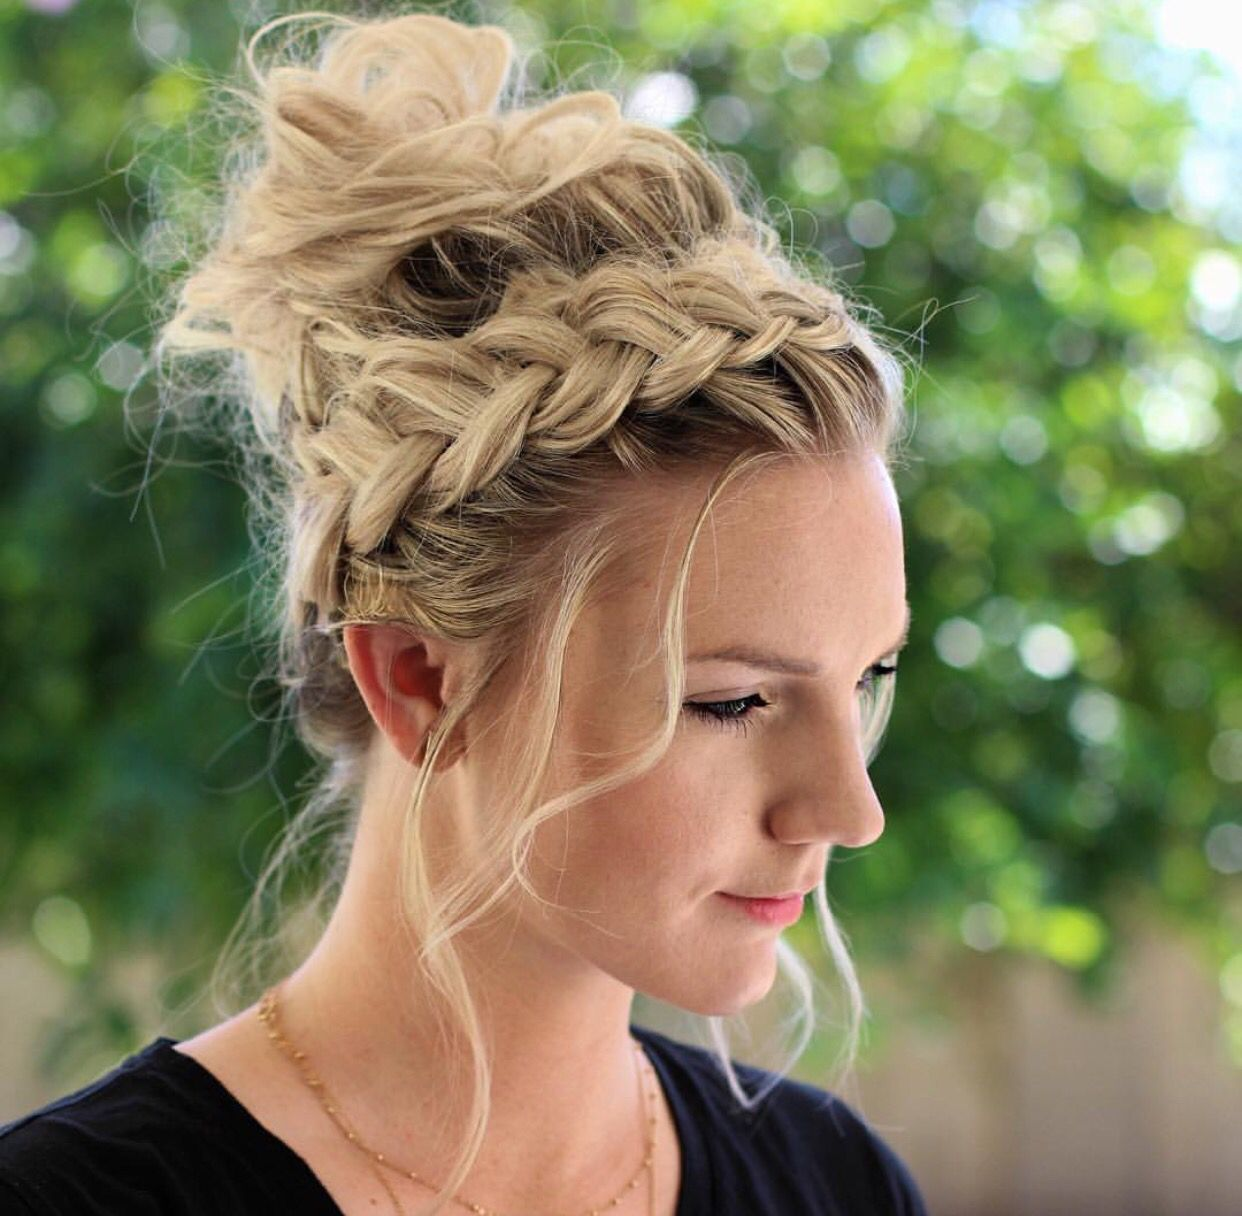 Braided Crown Wedding Hairstyle: How To: Crown Braid + Messy Bun